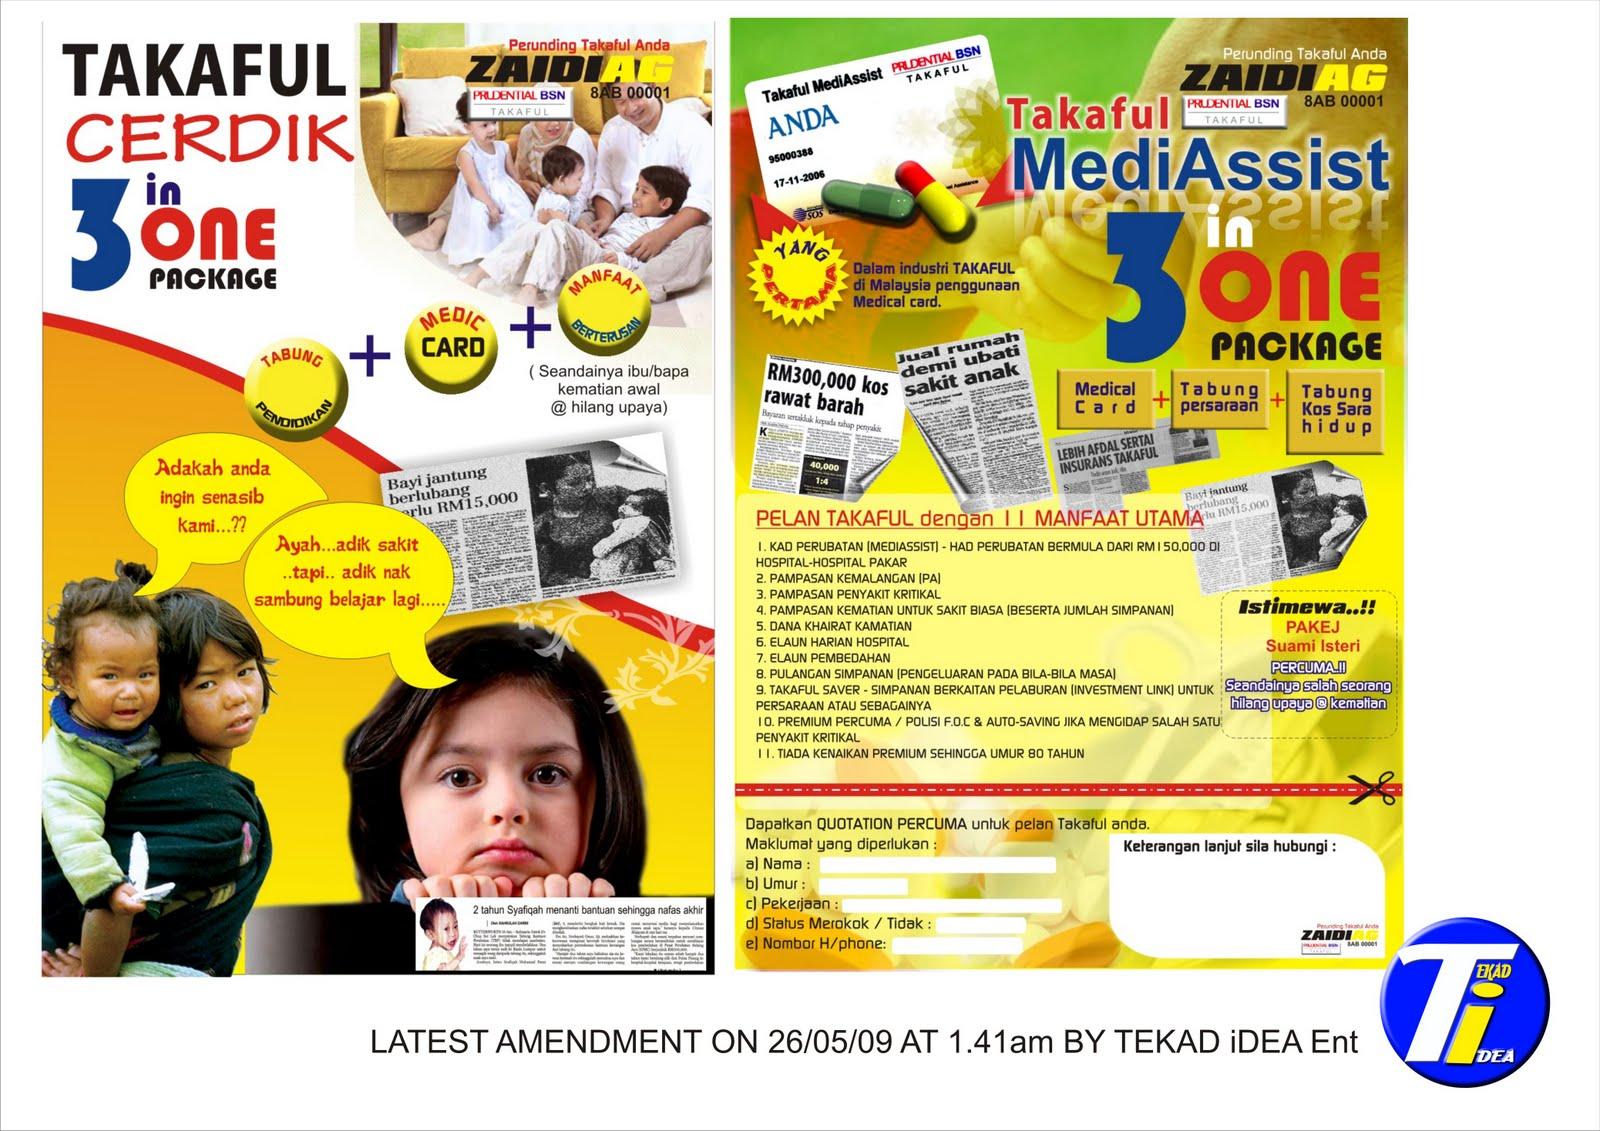 di sini ada beberapa contoh flyers prubsn takaful untuk renungan bersama